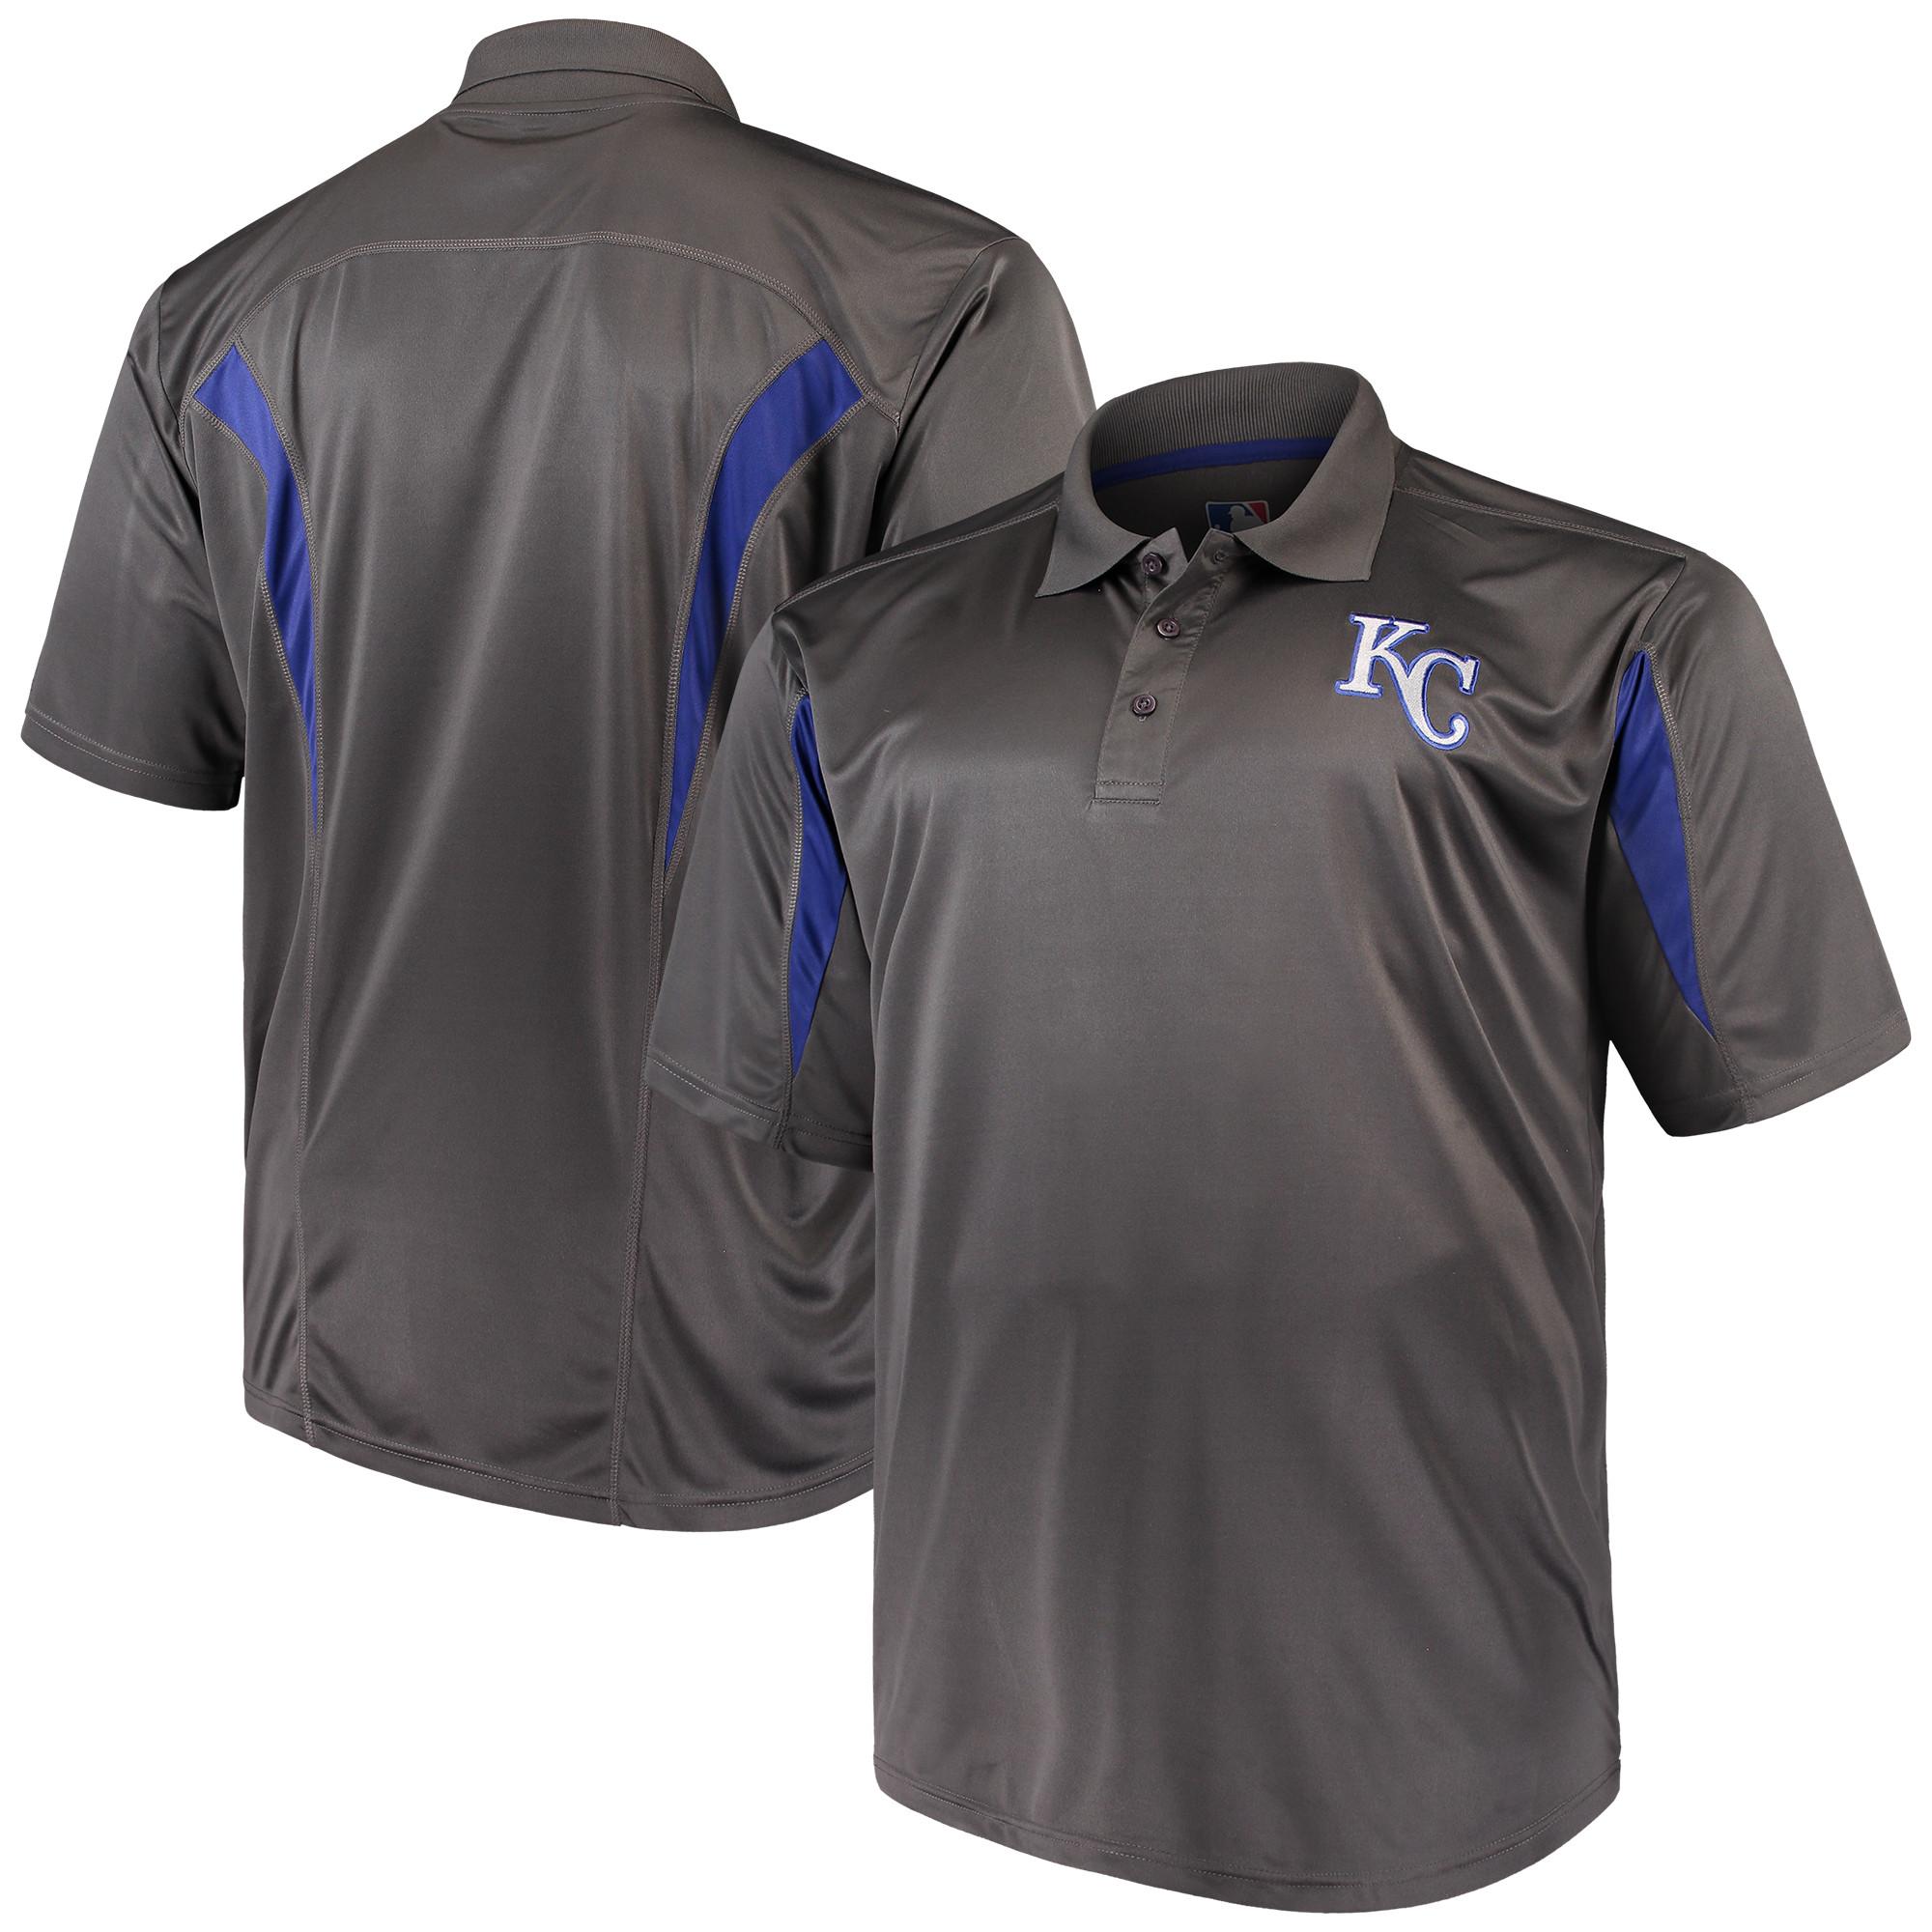 Kansas City Royals Majestic Contract Polo - Charcoal/Royal